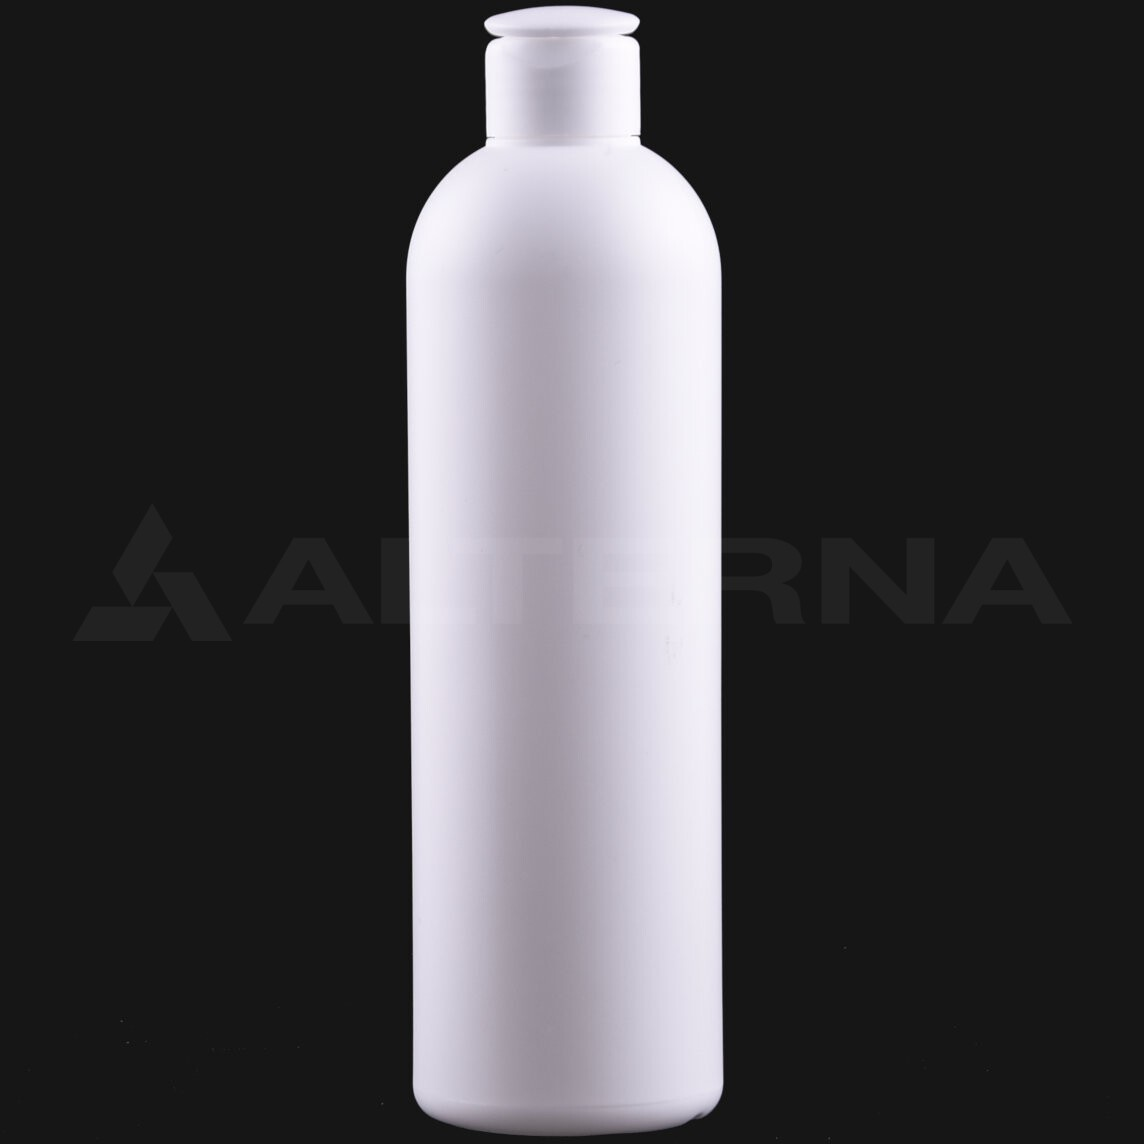 400 ml HDPE Bottle with 24 mm Flip Top Cap